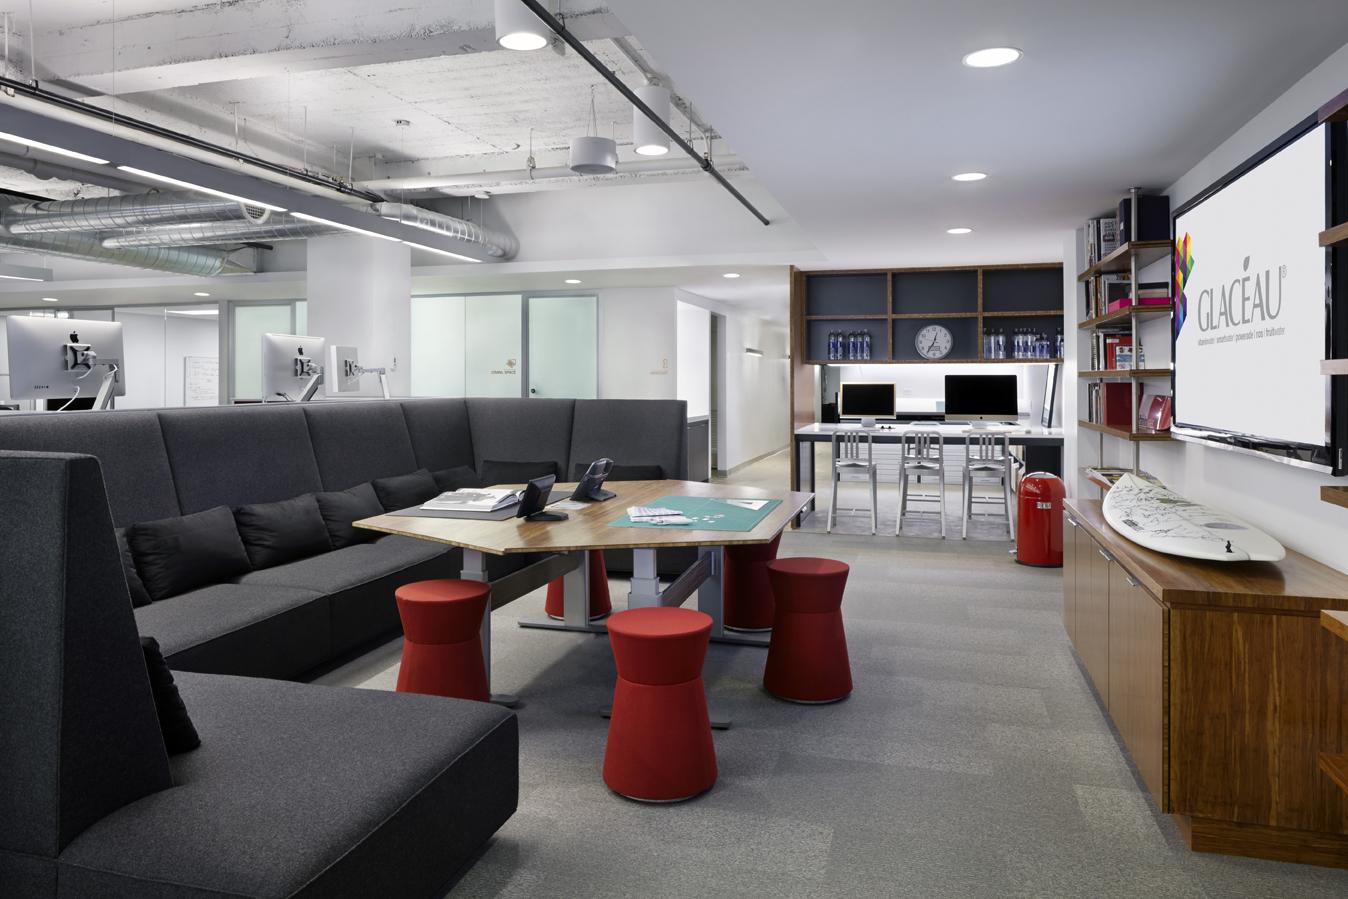 Coca-Cola / vitaminwater / smartwater office design, custom furniture